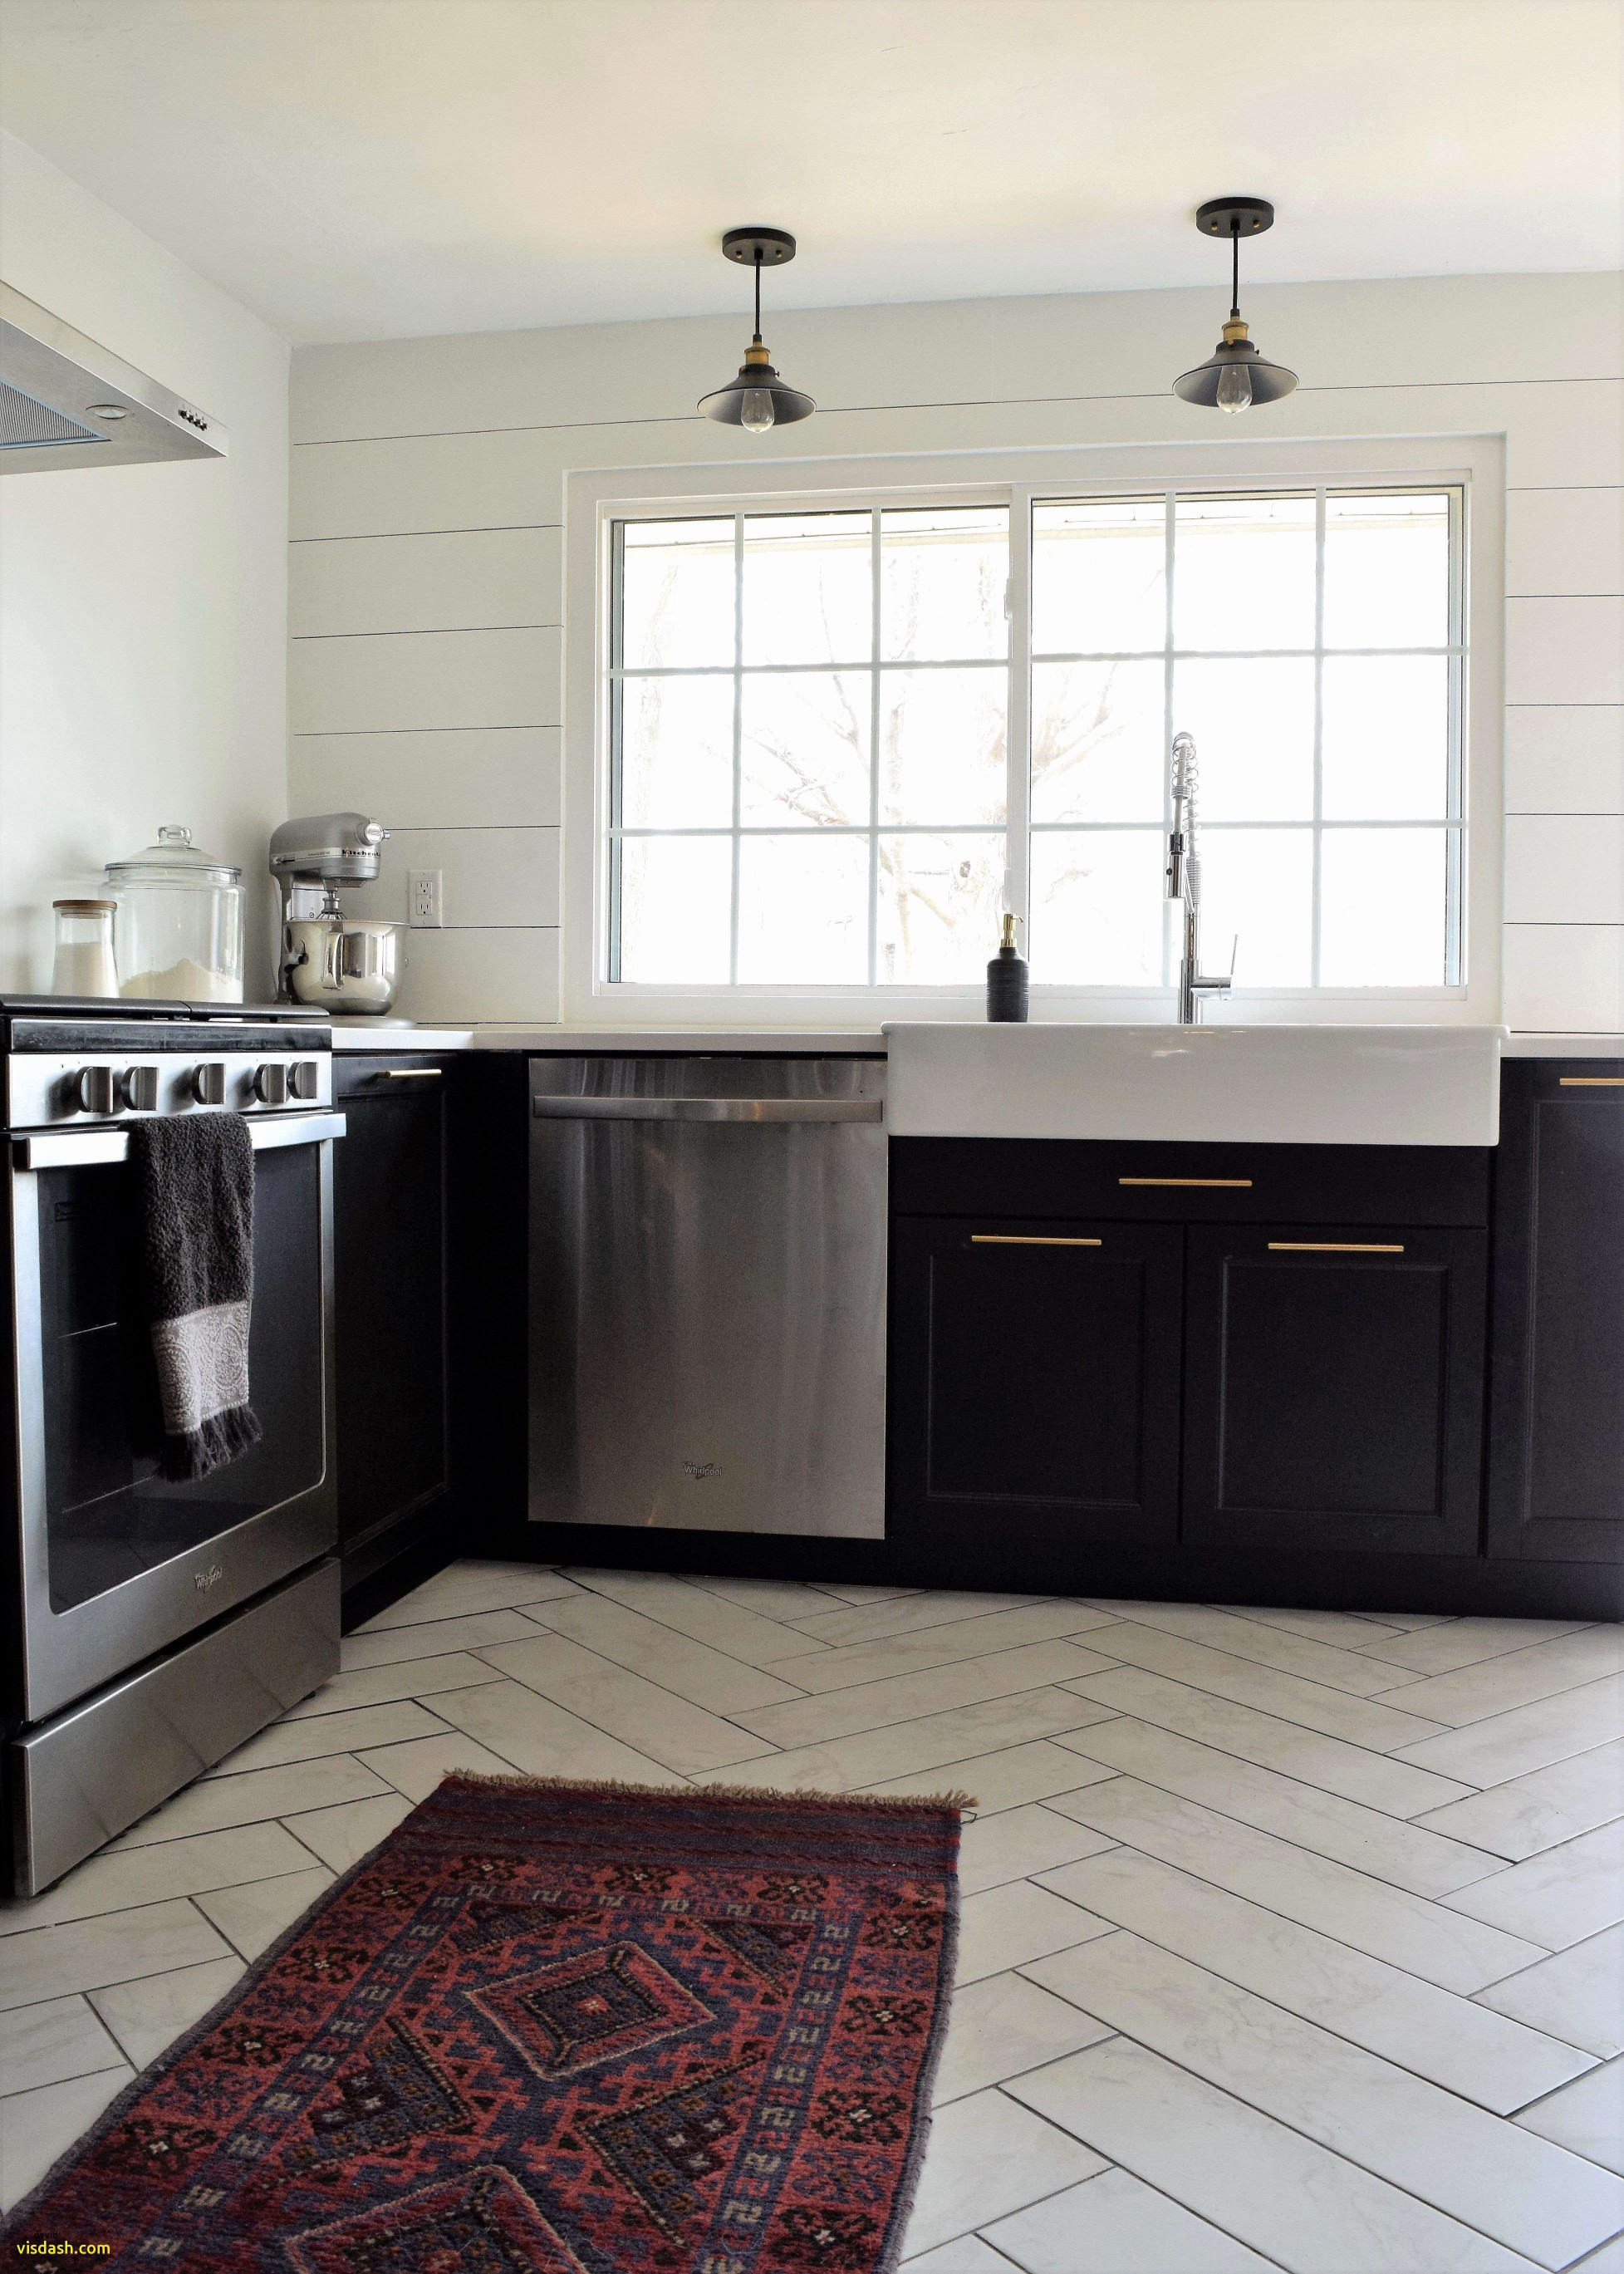 hardwood floor options of tiled kitchen inspirational design a kitchen awesome stunning tile for tiled kitchen inspirational design a kitchen awesome stunning tile kitchen in kitchen design 0d